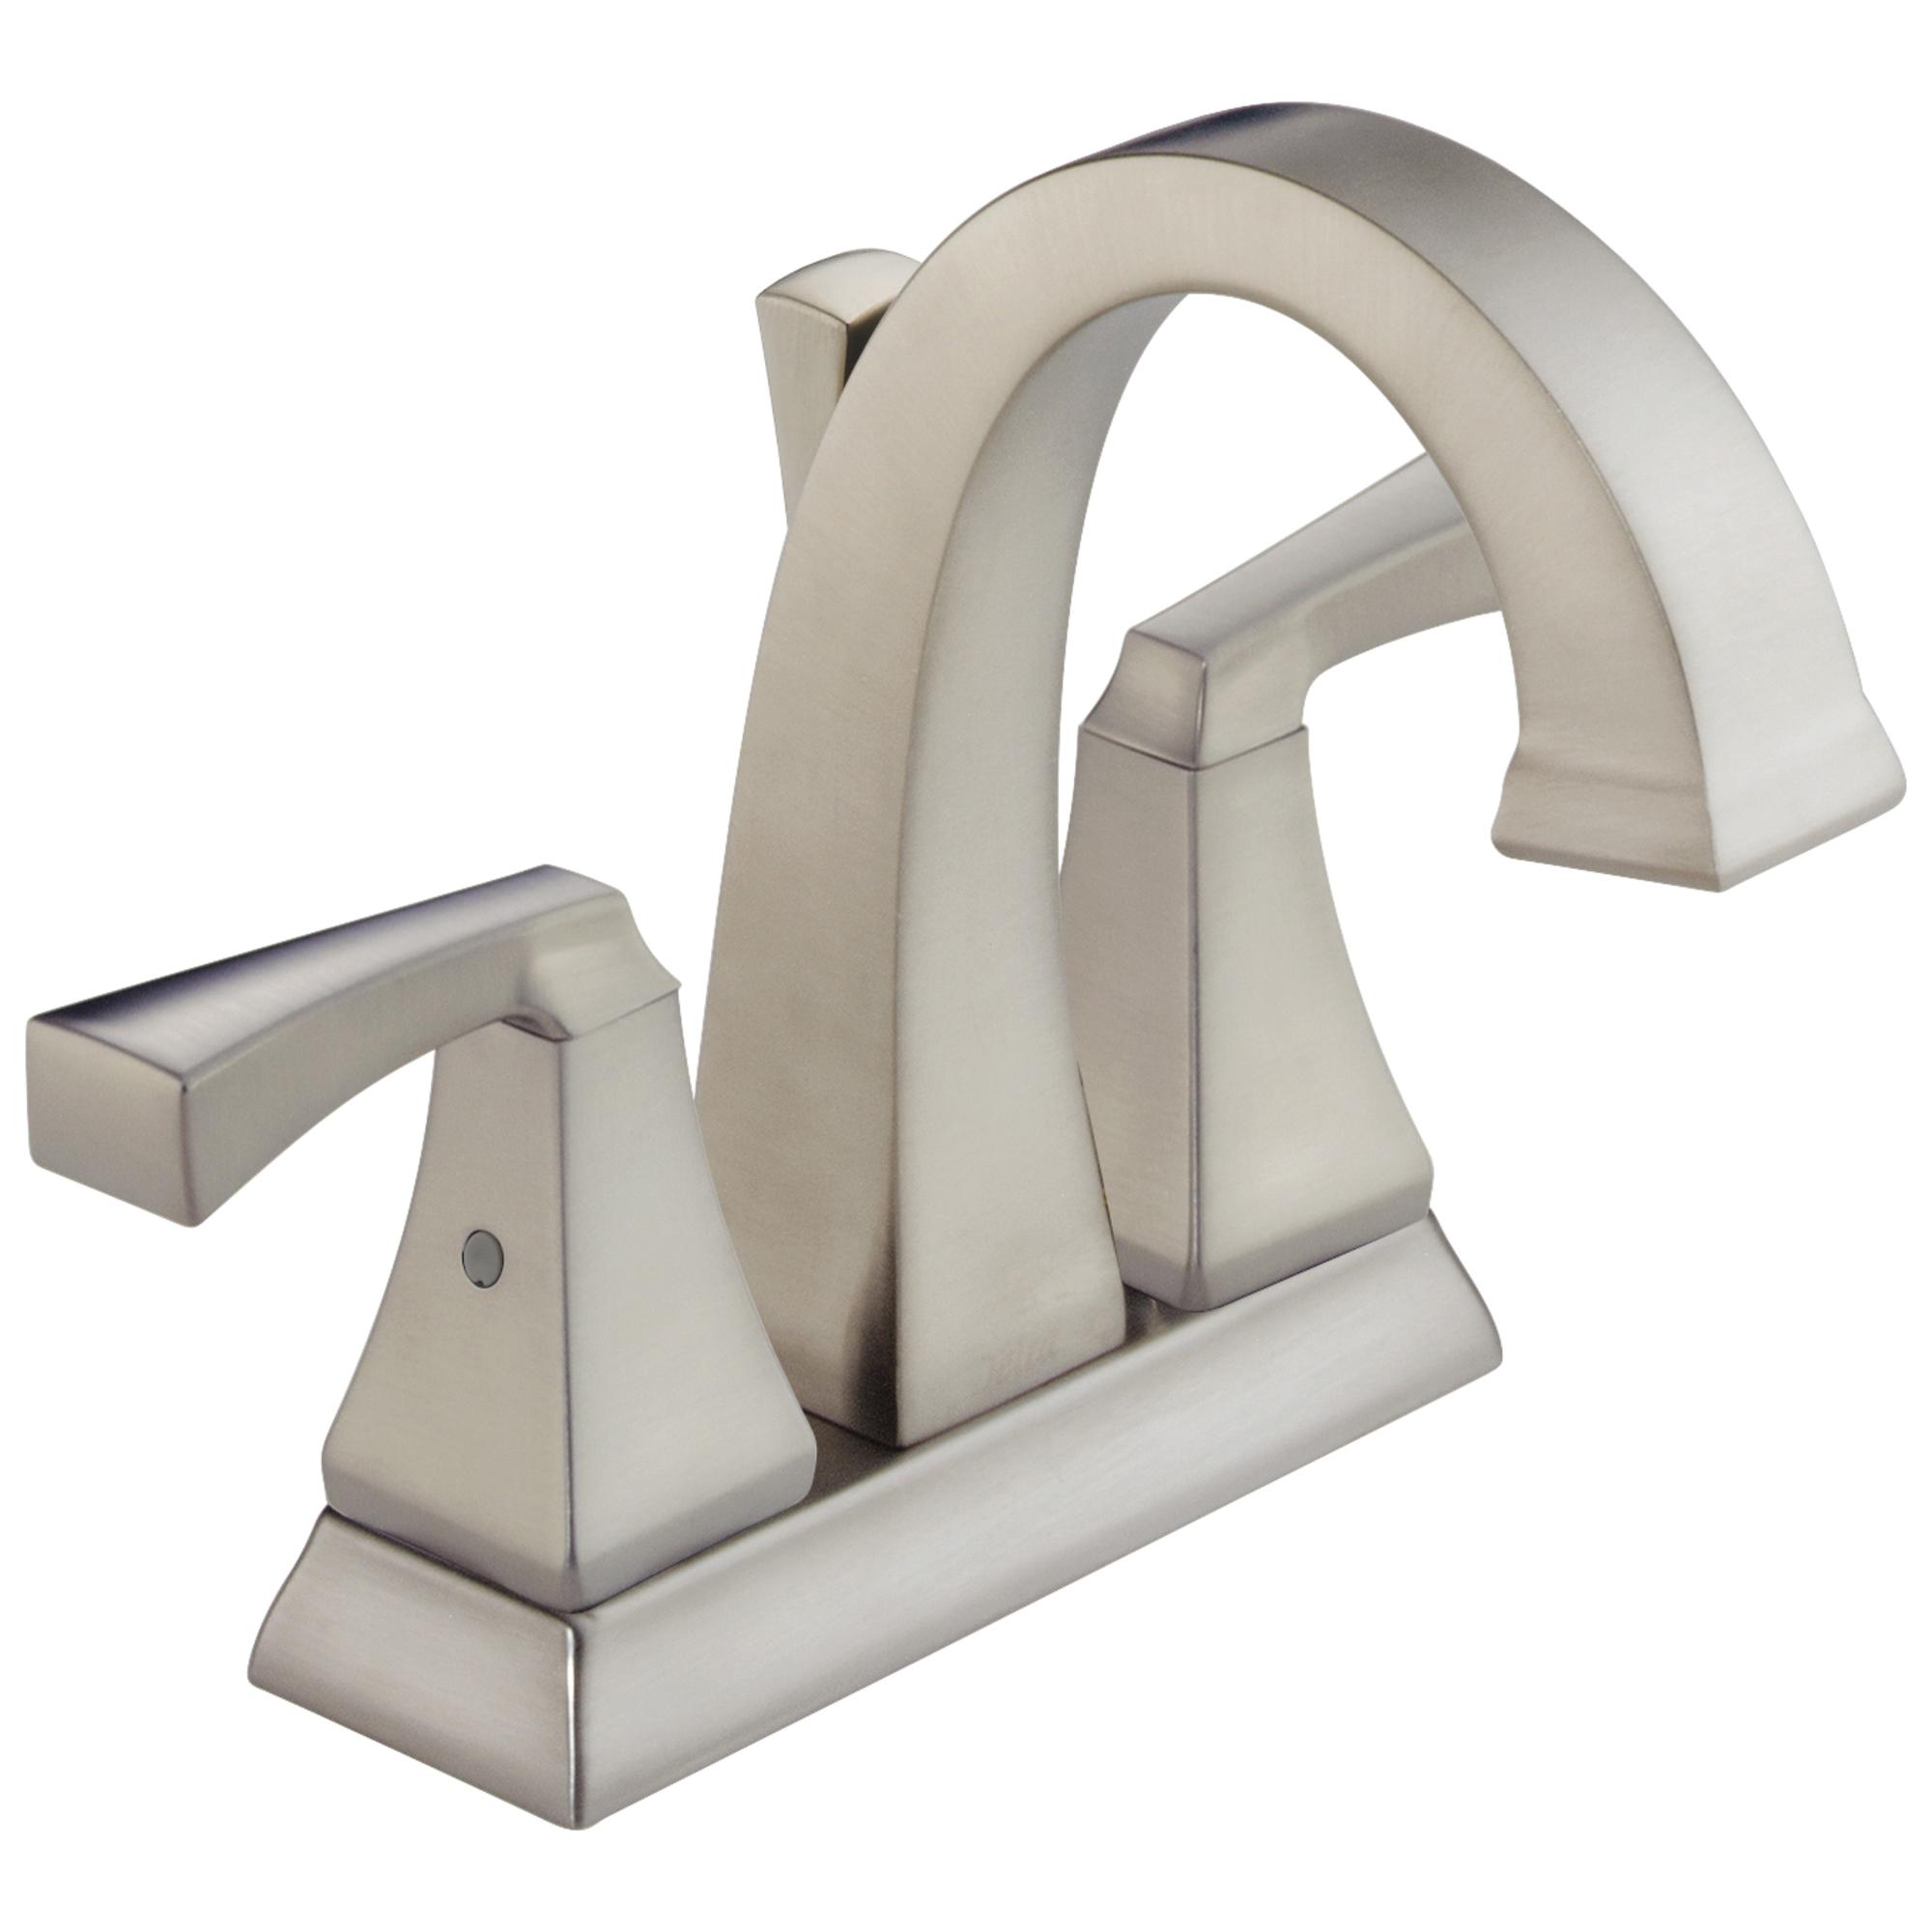 DELTA® 2551-SPMPU-DST Centerset Lavatory Faucet, Dryden™, SpotShield® Stainless Steel, 2 Handles, Metal Pop-Up Drain, 1.2 gpm